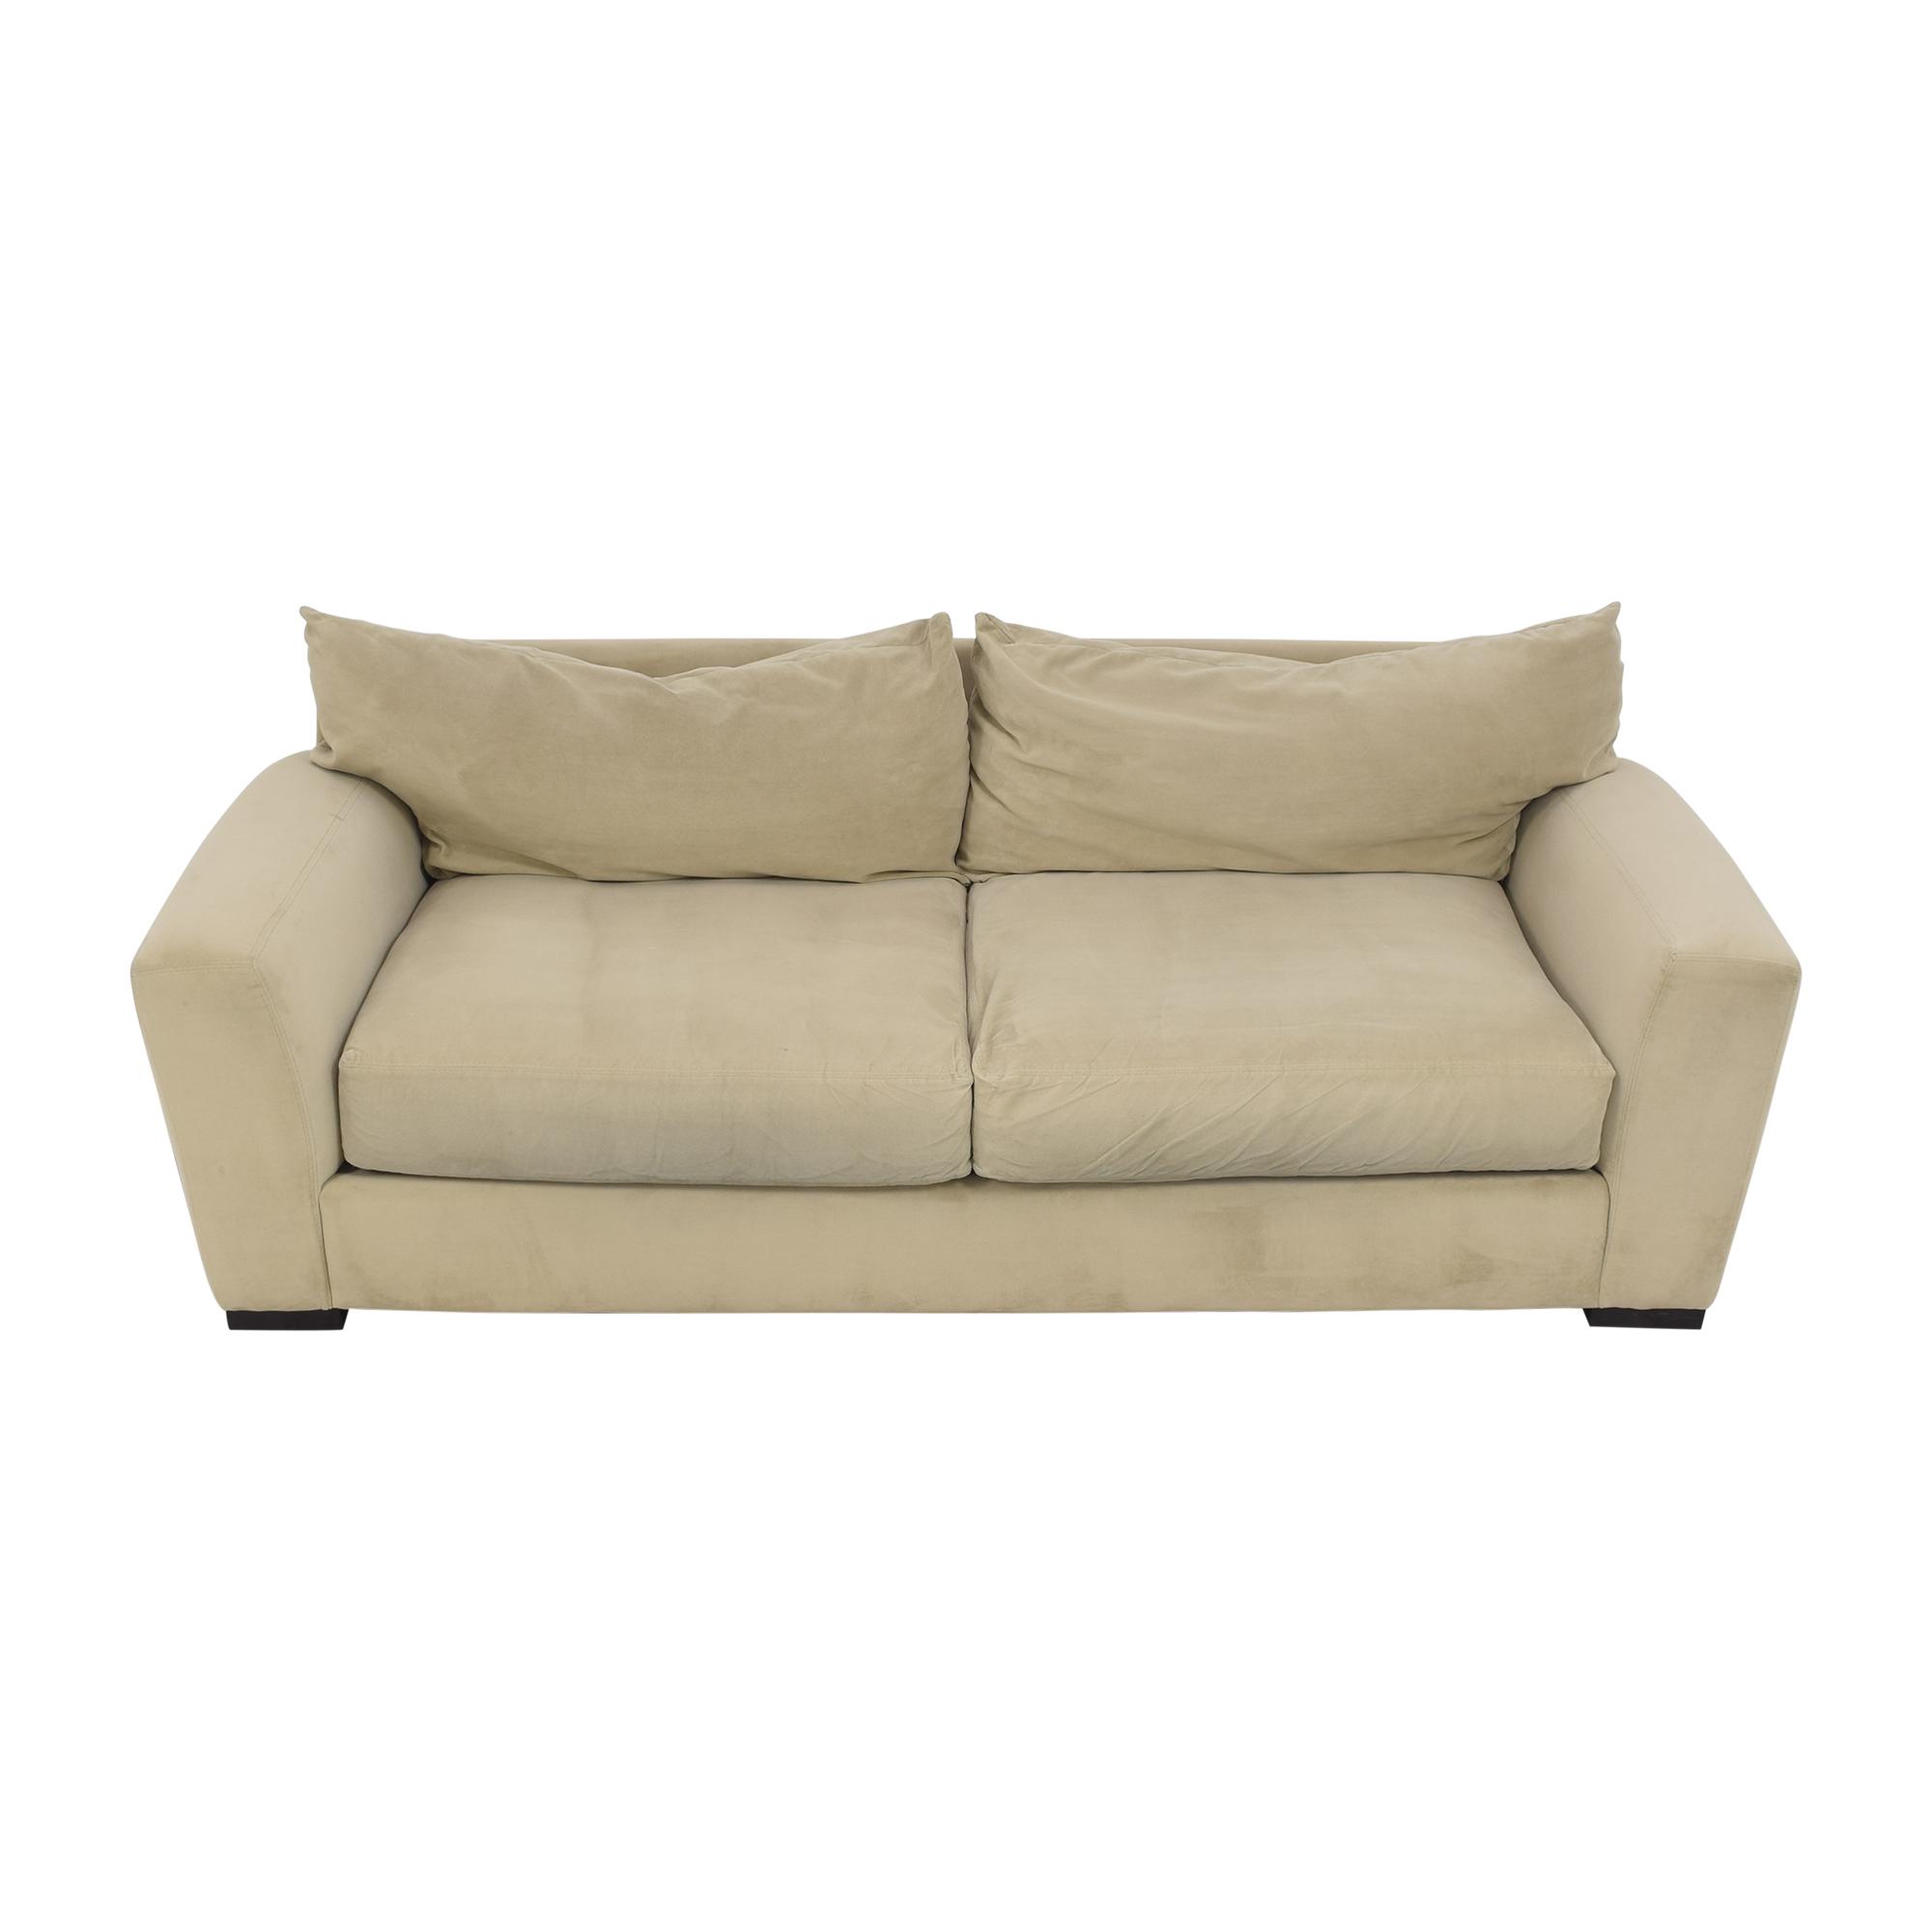 Raymour & Flanigan Raymour & Flanigan Two Cushion Sofa price